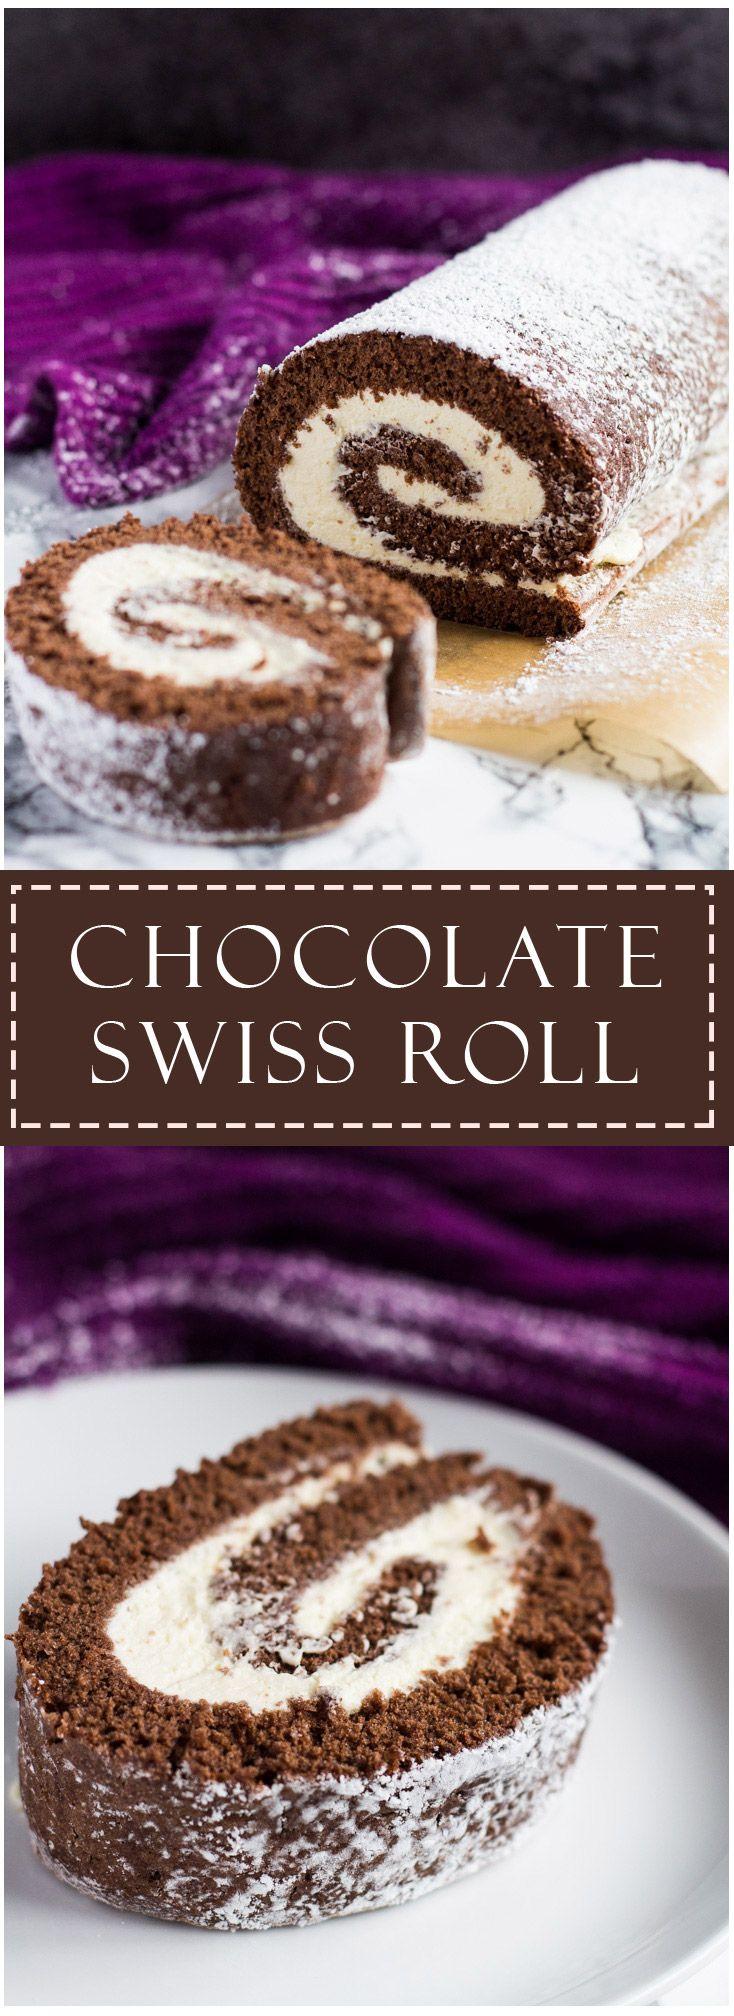 chocolate swiss roll kosher desserts swiss desserts chocolate pictures ...